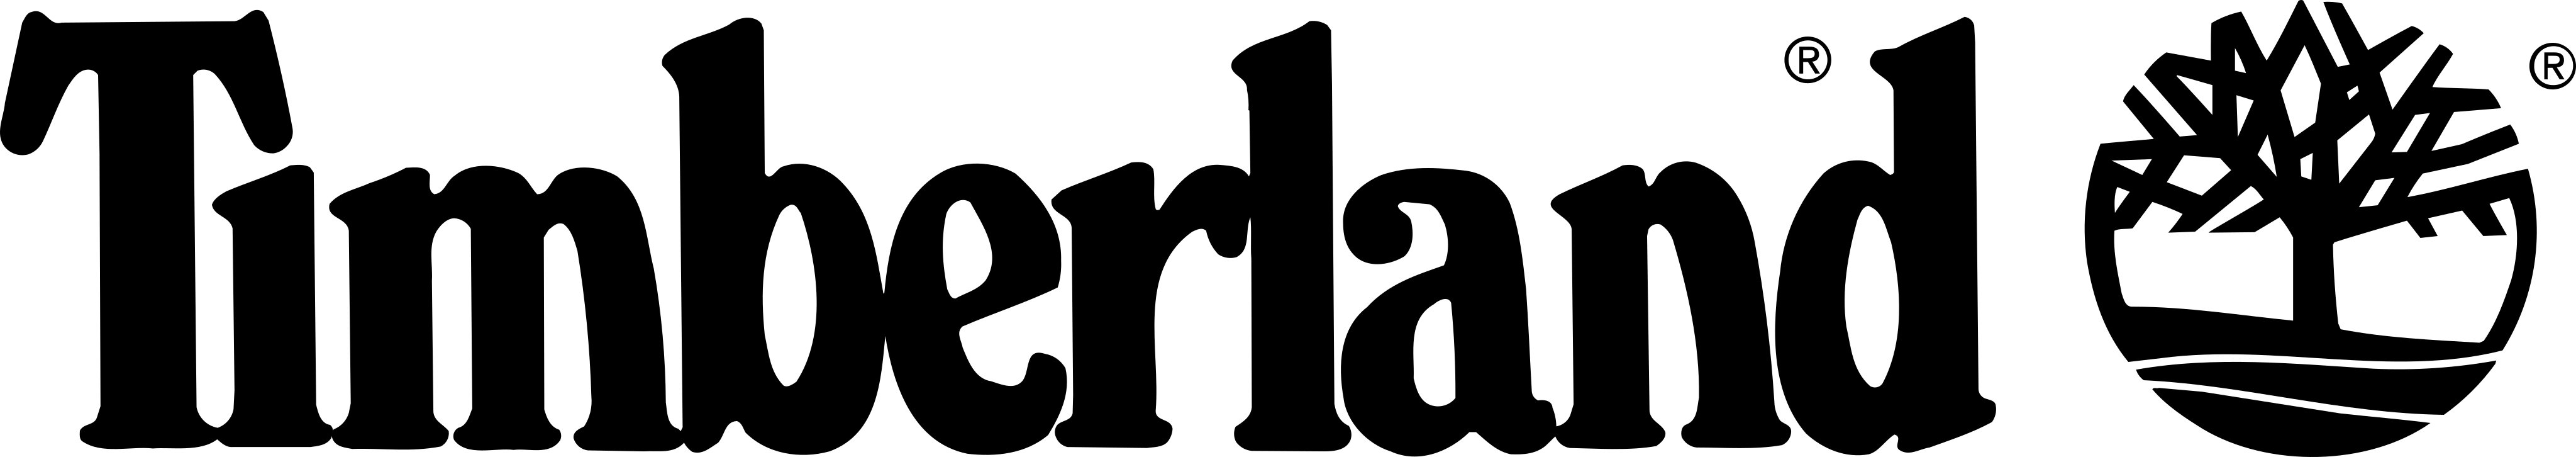 timberland logo - Timberland Logo